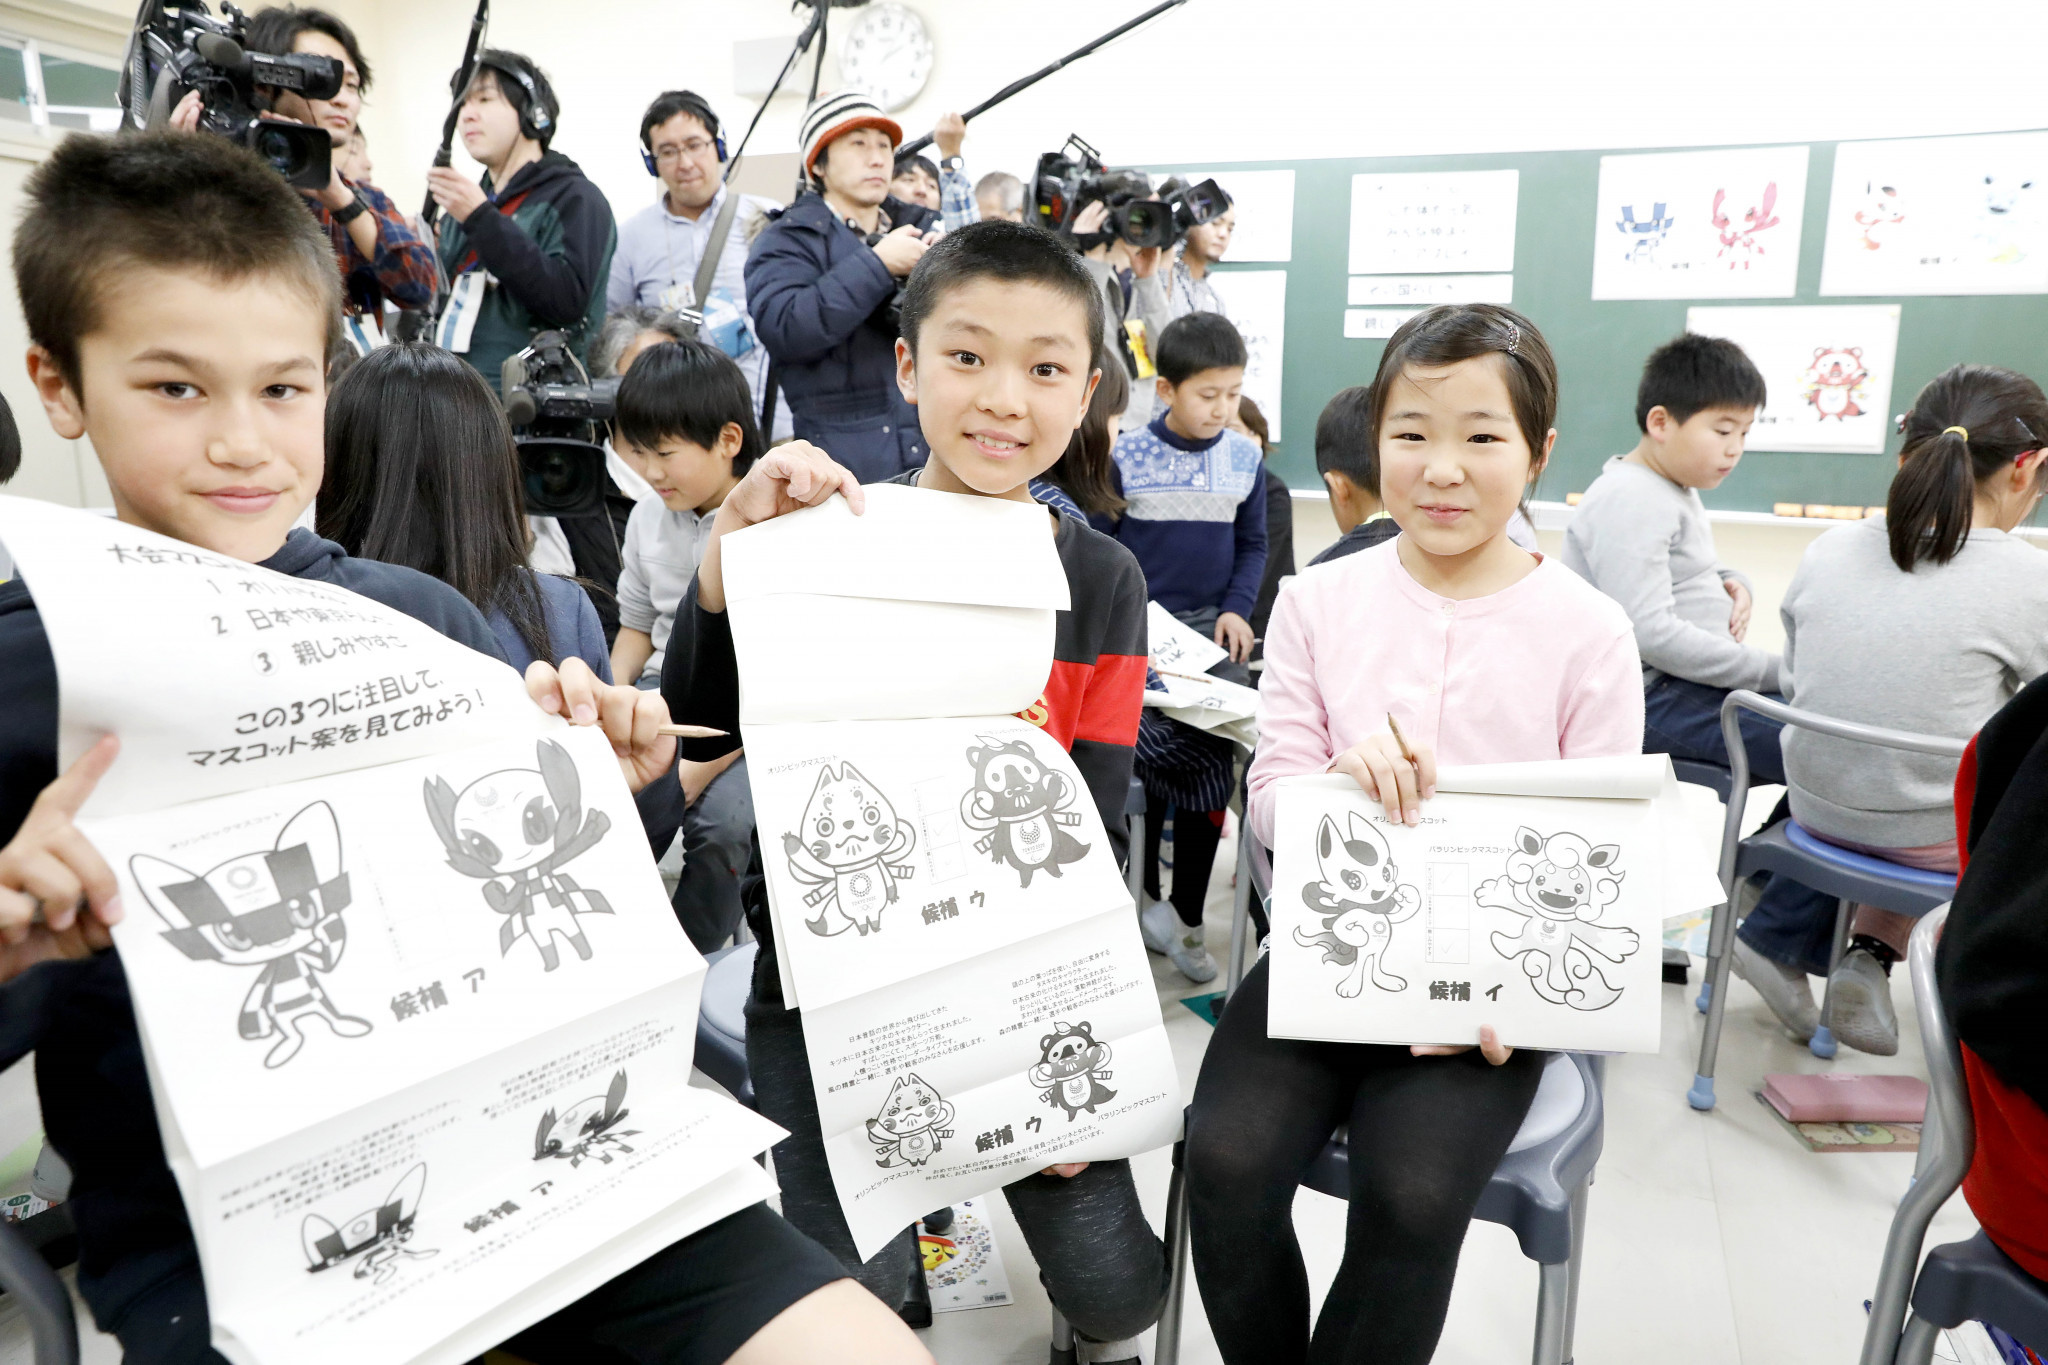 Children have begun voting for their preferred Tokyo 2020 mascots in schools across Japan ©Tokyo 2020